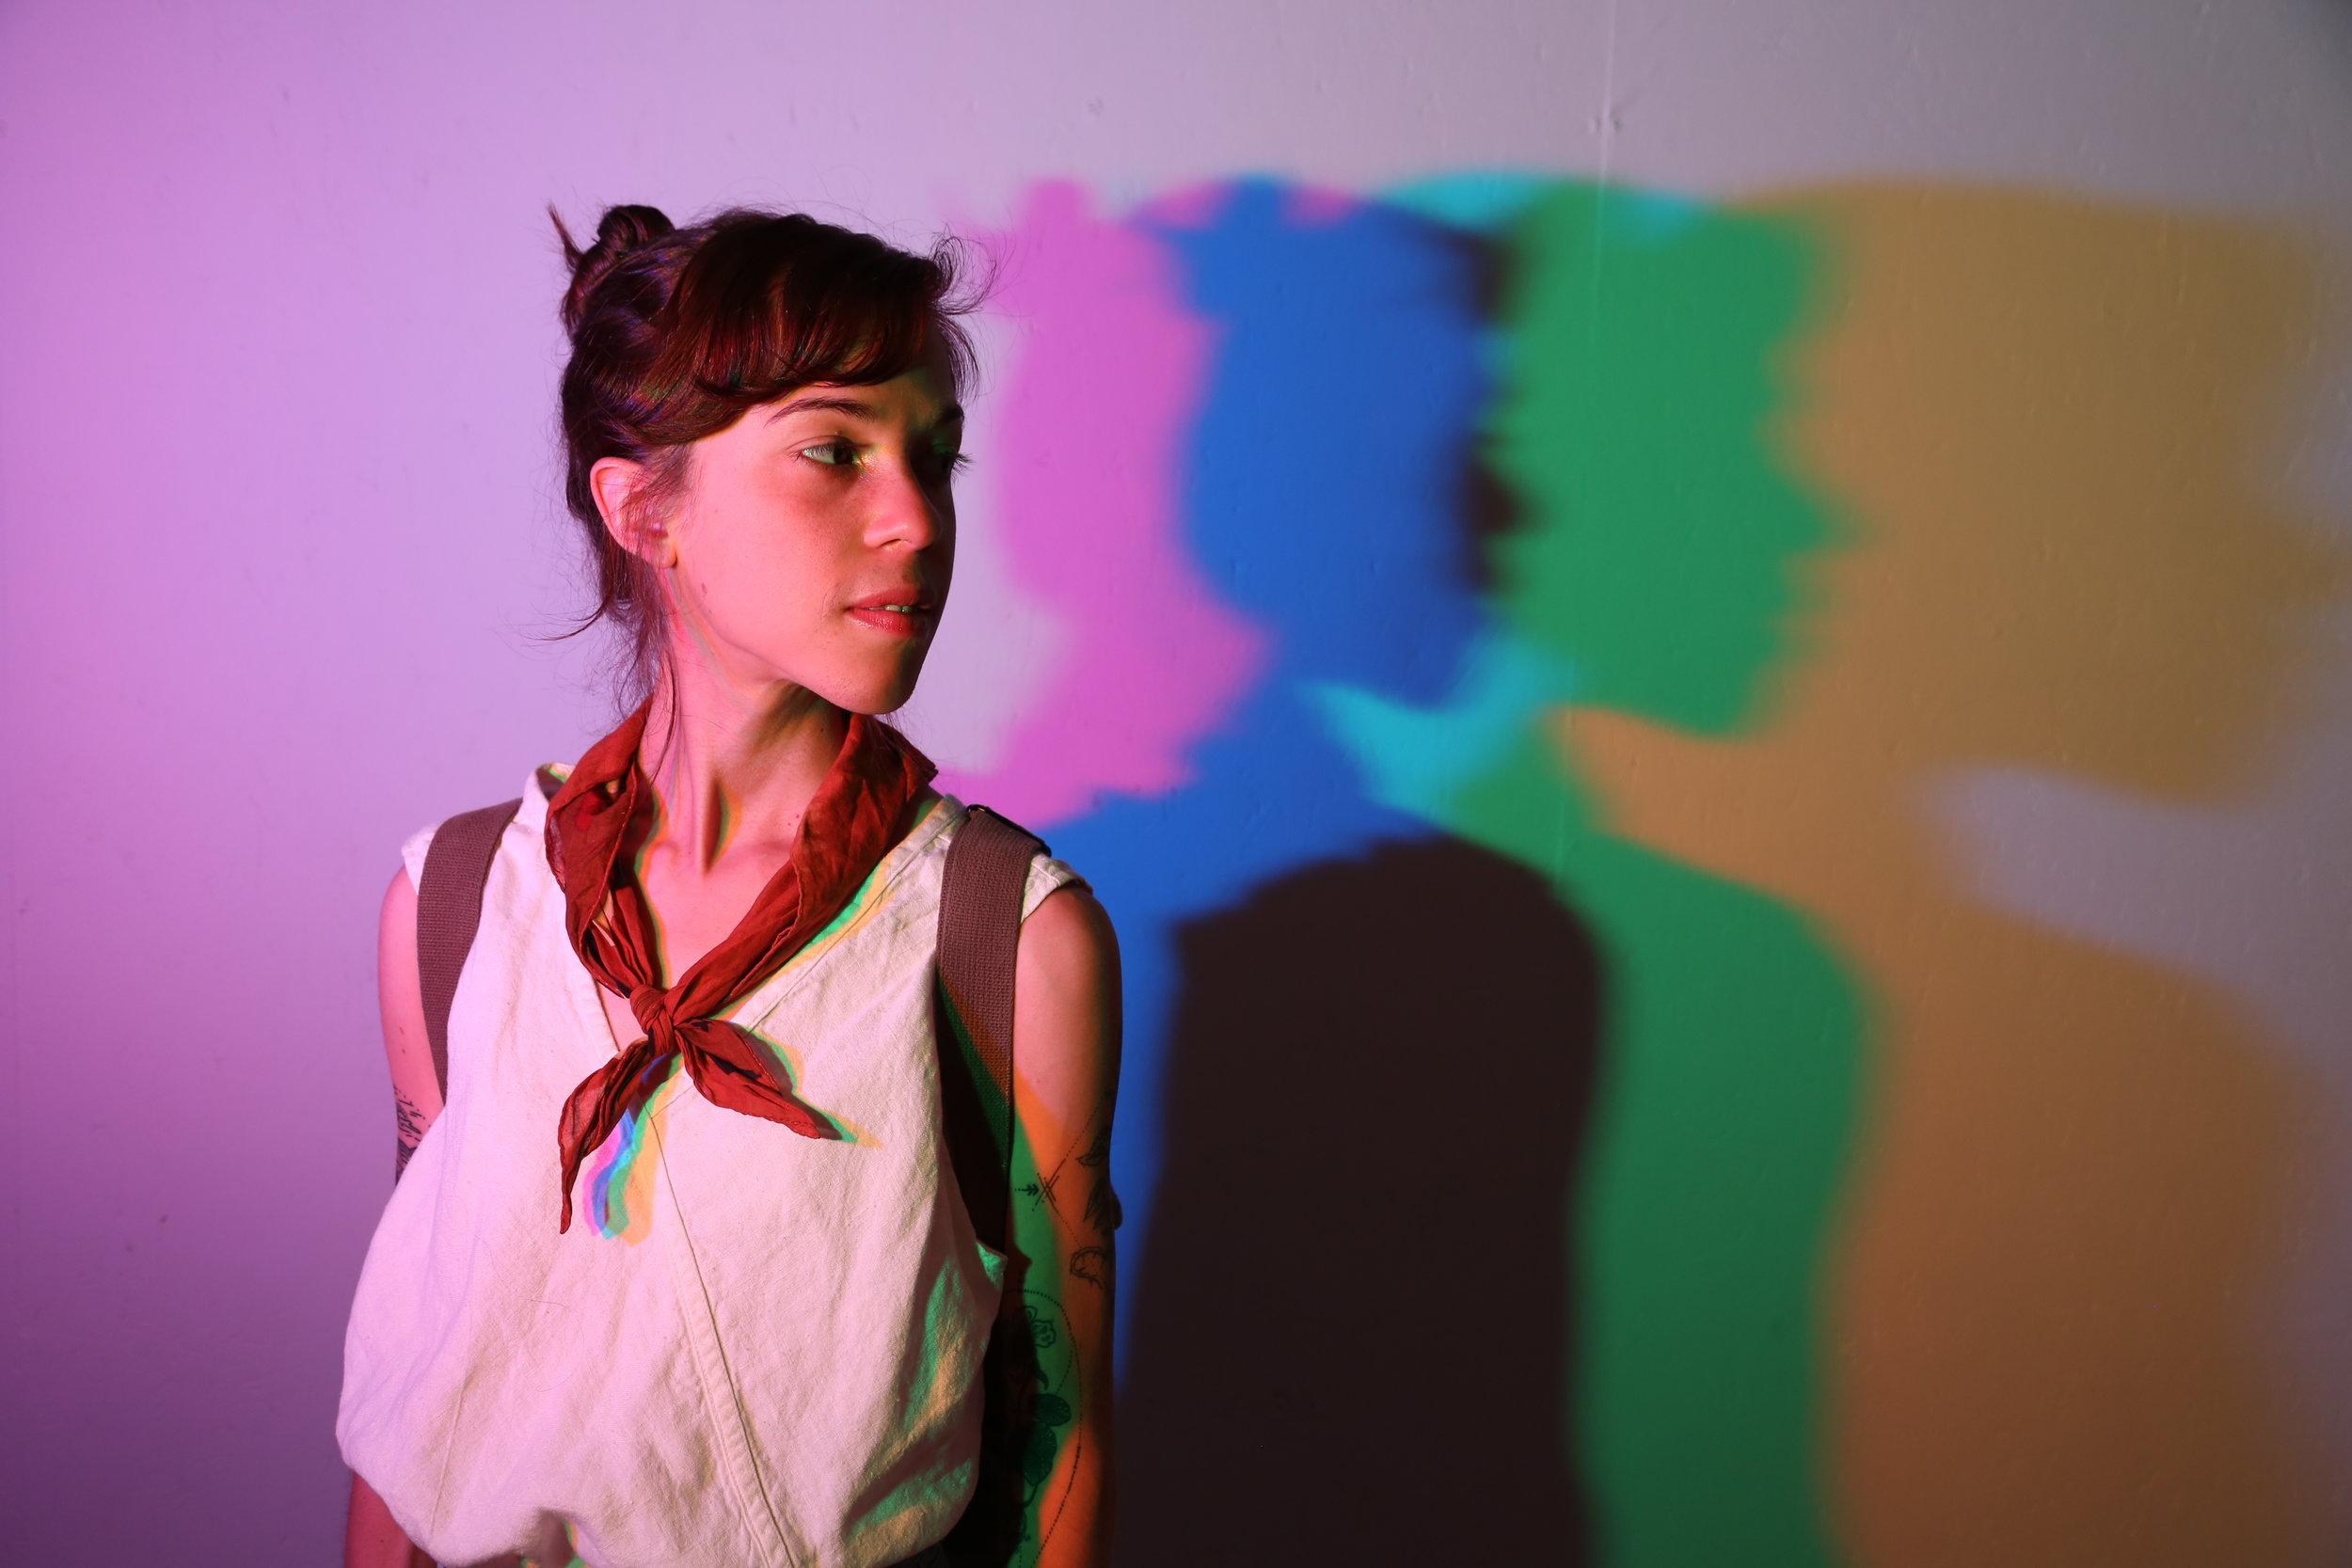 Technicolor-Photo-Jeremy-Pair-220.JPG